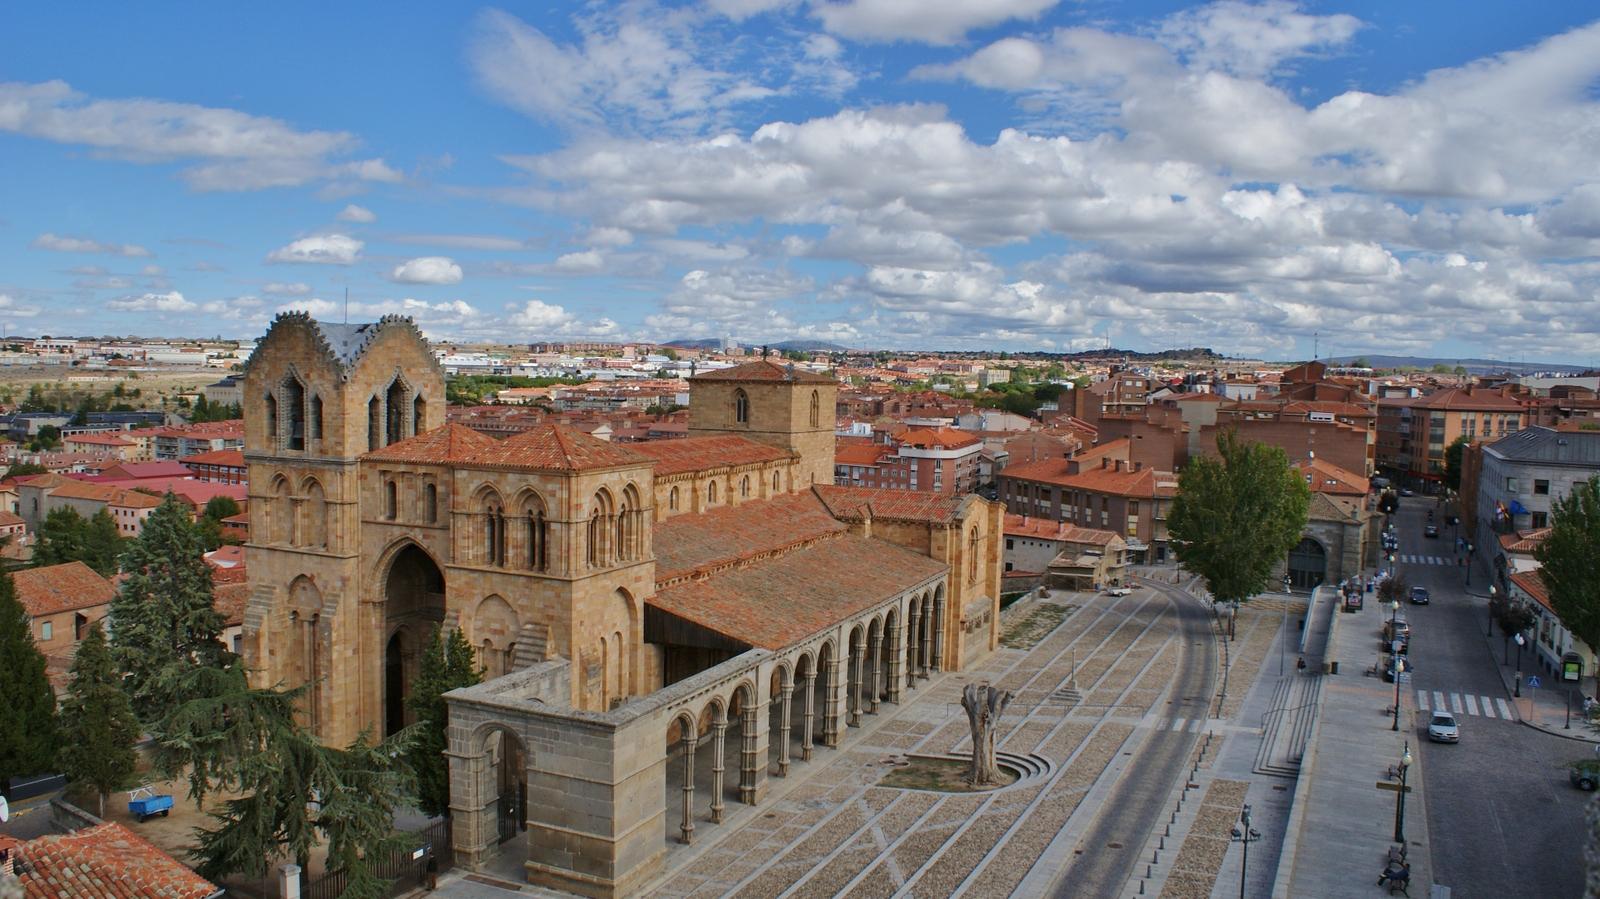 File:Basílica de San Vicente, Ávila 02.JPG - Wikimedia Commons